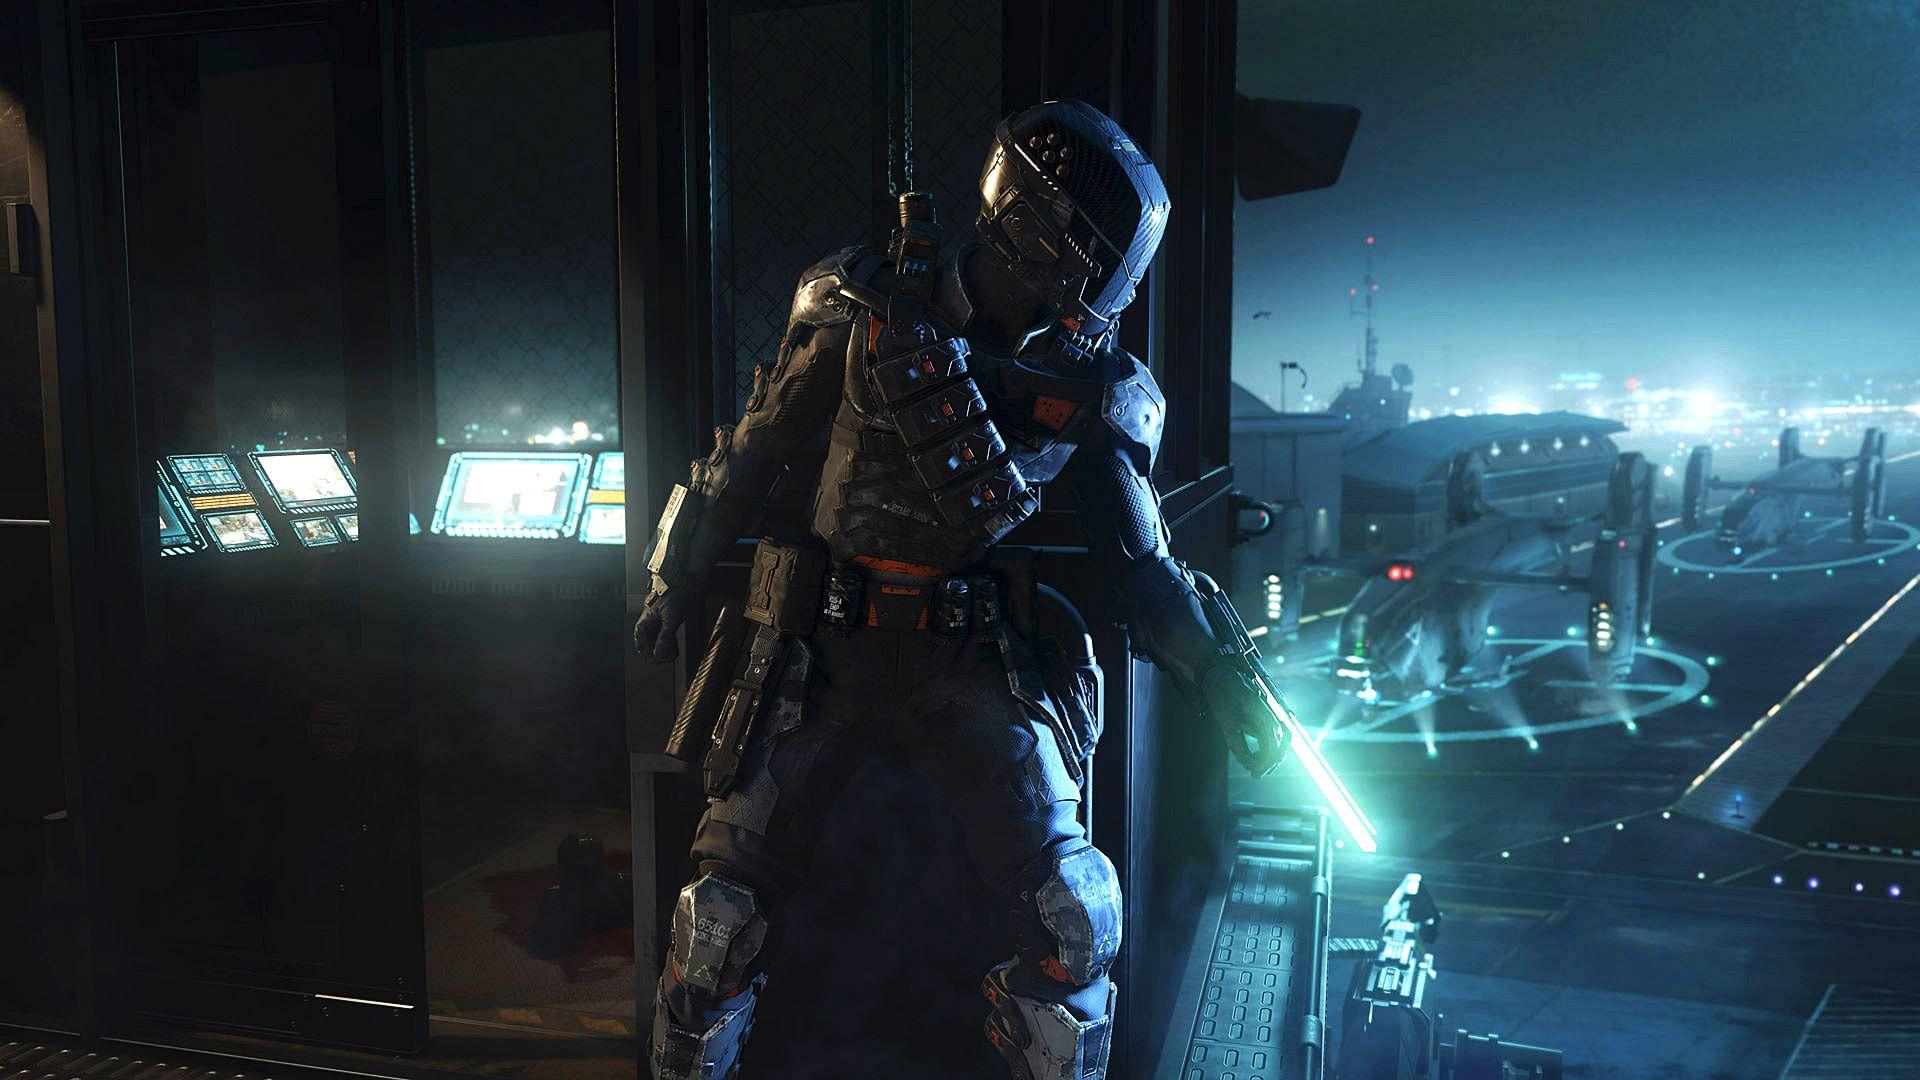 Cod Black Ops 3 Specialist Spectre Gambar Wallpaper Ponsel